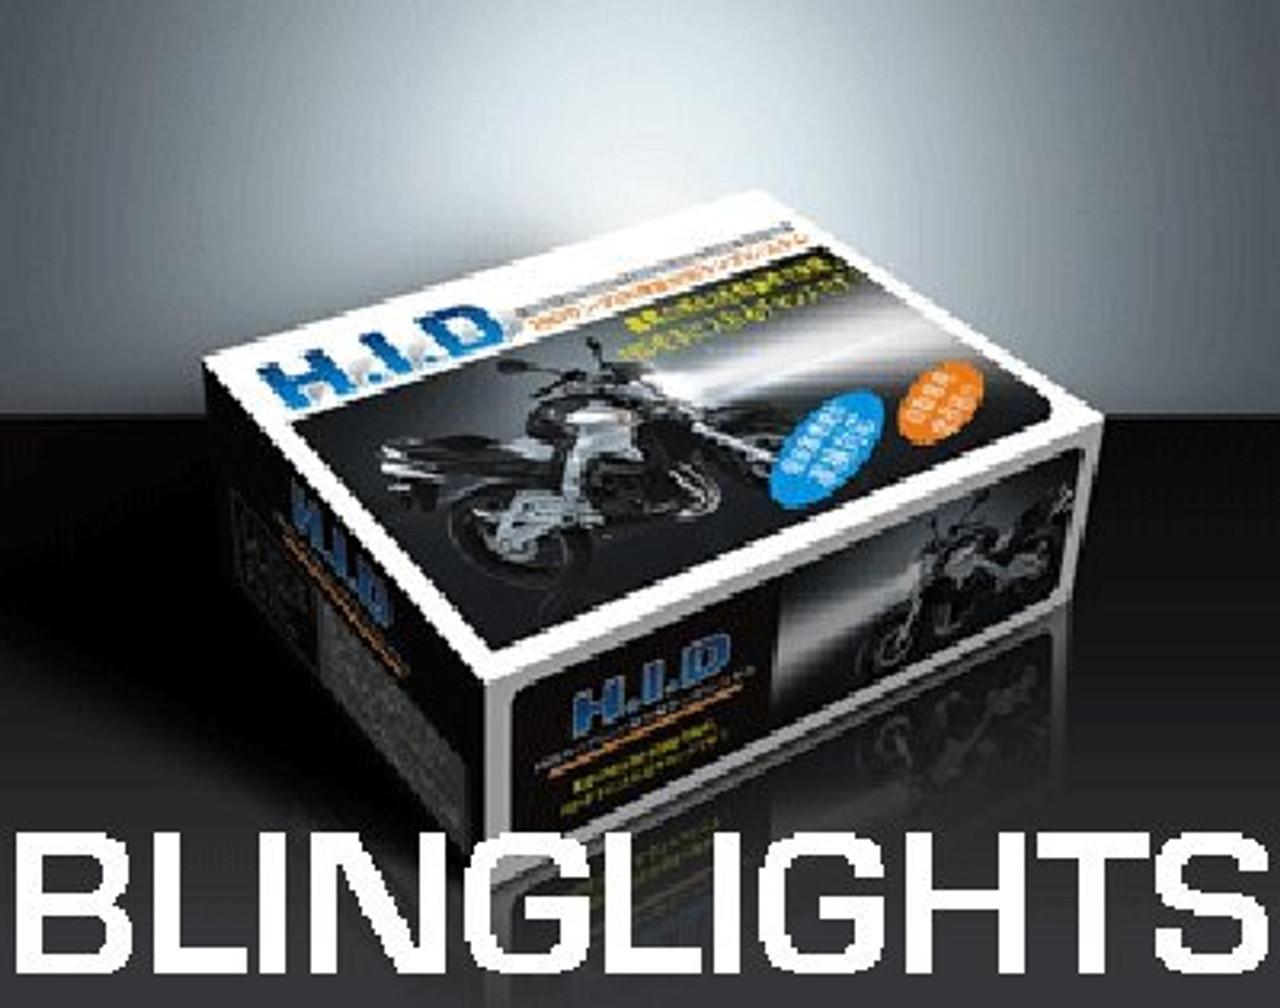 1996-2009 HARLEY-DAVIDSON HERITAGE SOFTTAIL HID HEAD LIGHT LAMP 2002 2003 2004 2005 2006 2007 2008